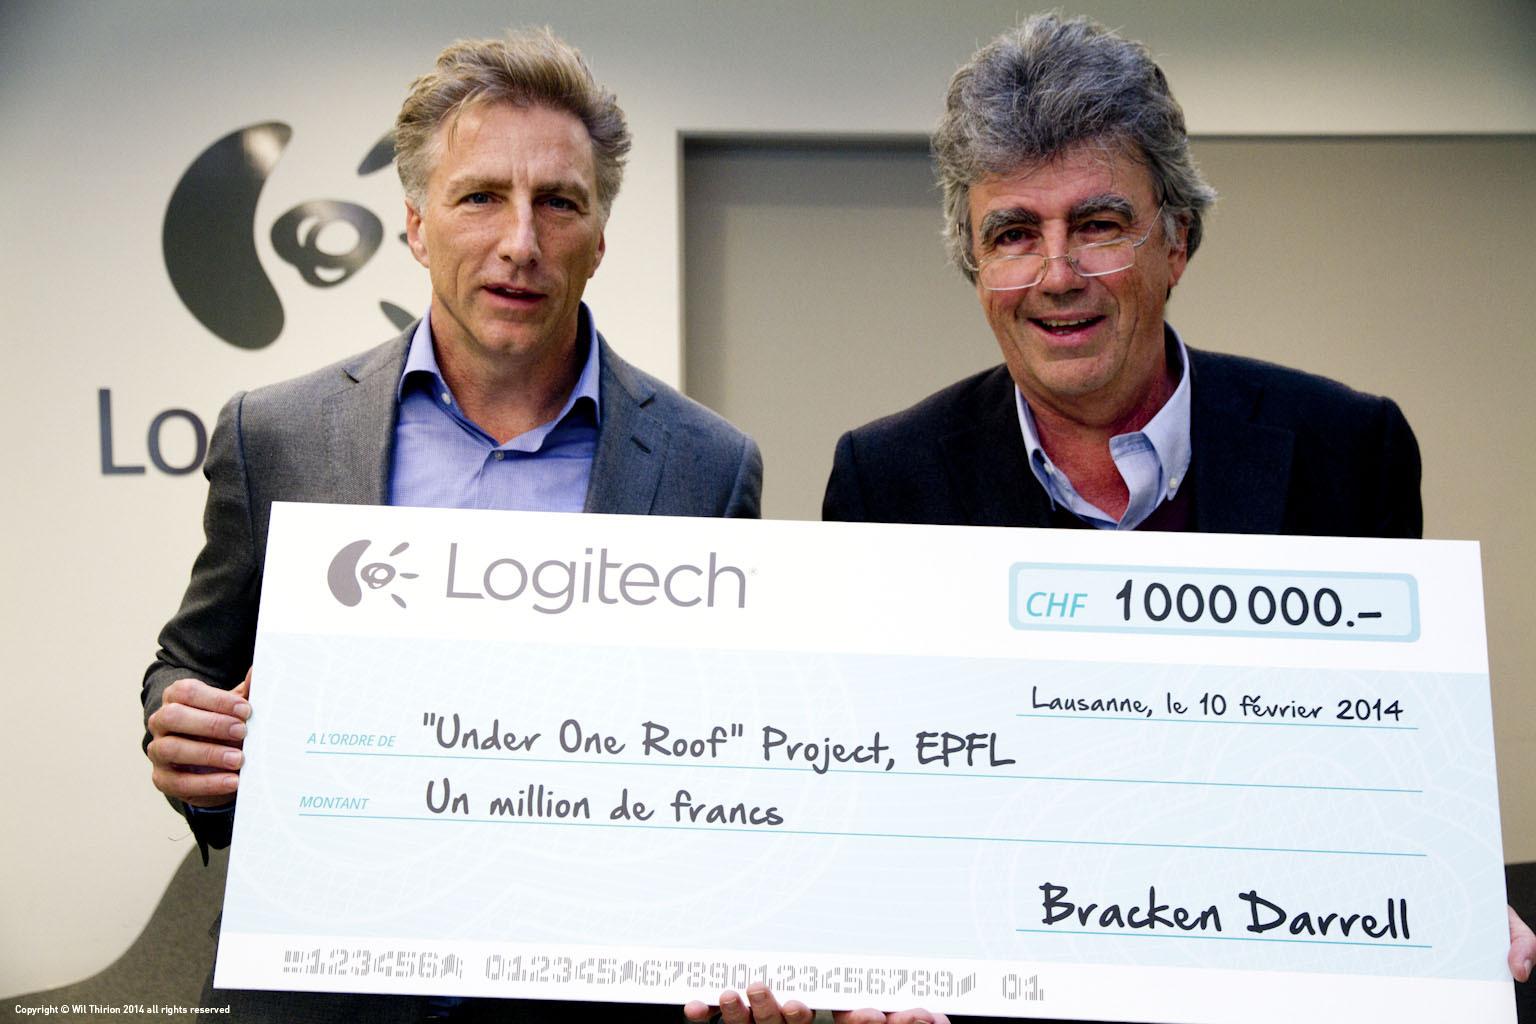 Bracken Darrell, CEO and president of Logitech, and Patrick Aebischer, president of EPFL. (Photo: Business Wire)